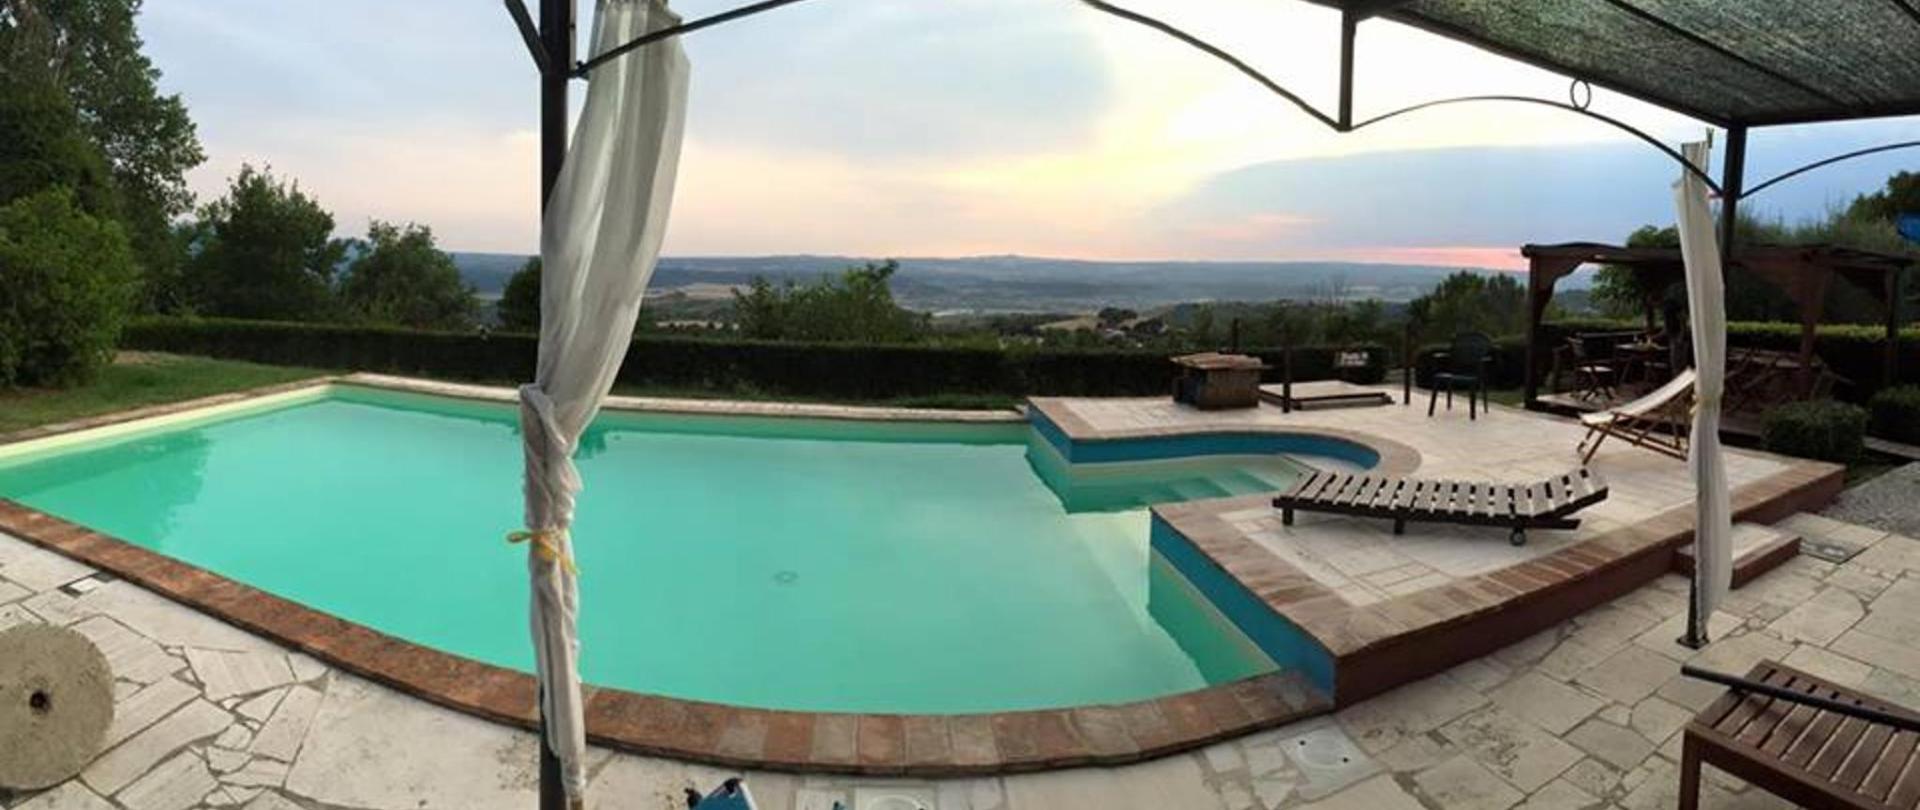 Pool und panorama.jpg